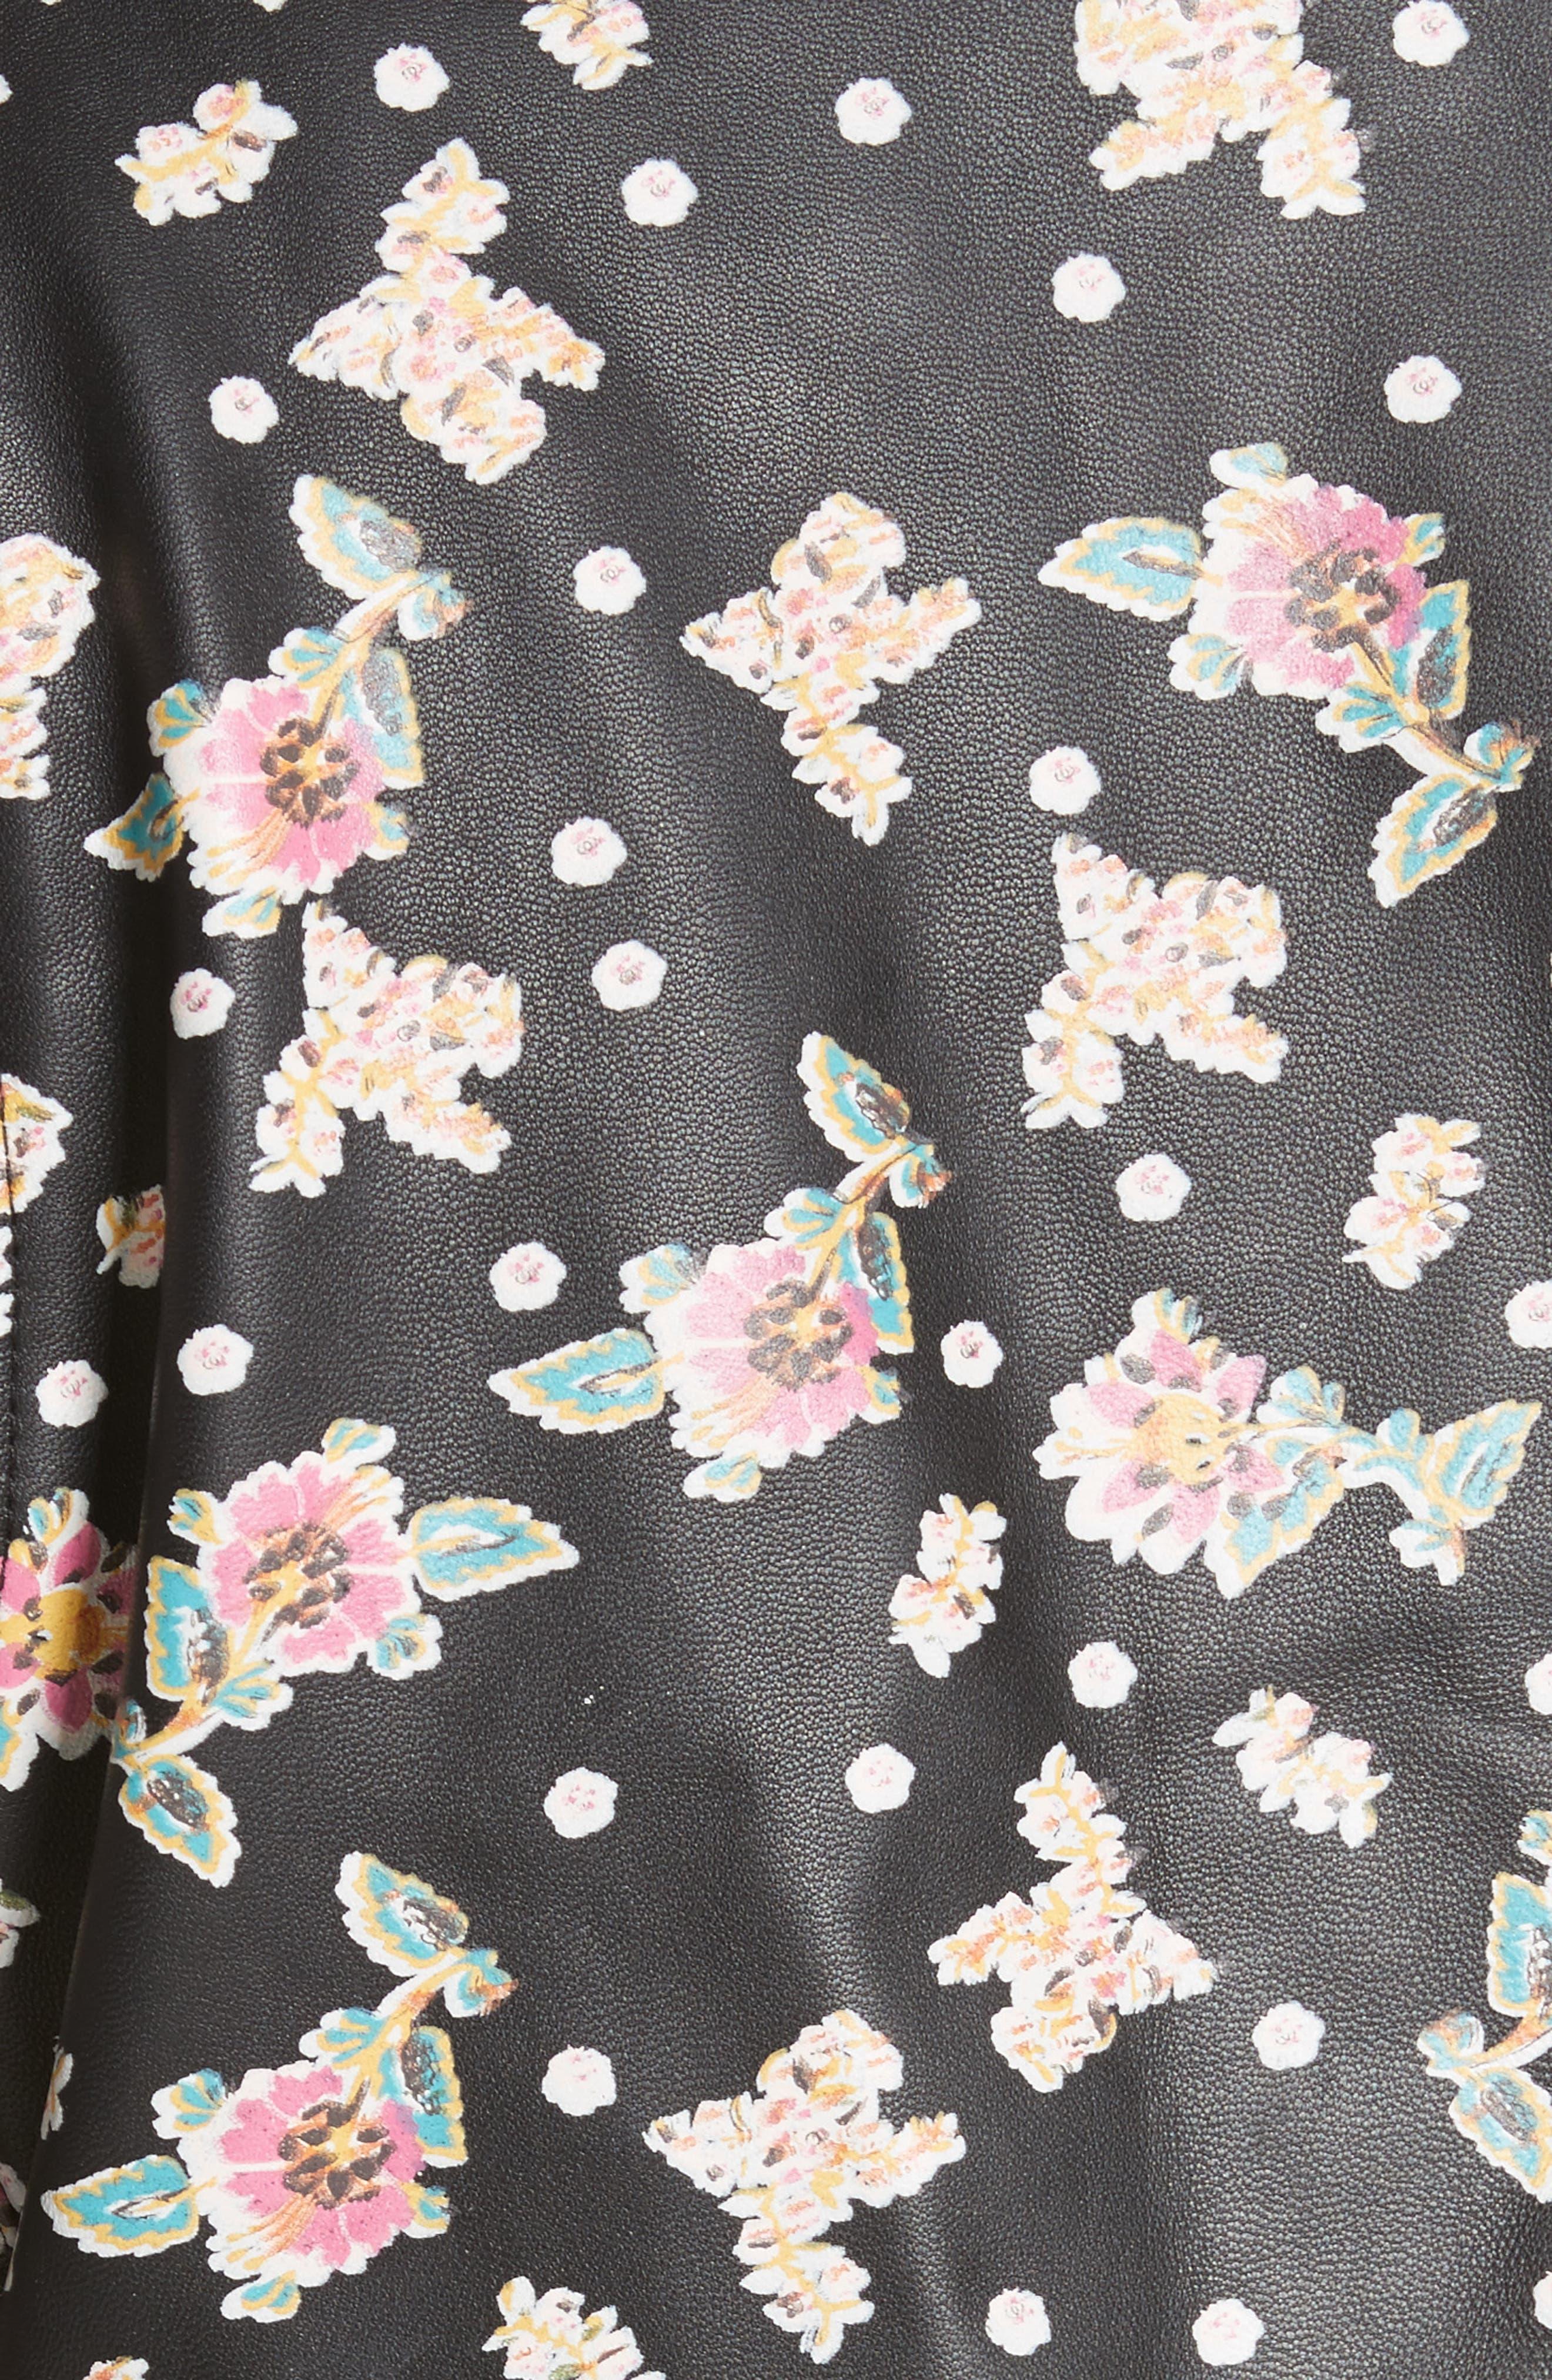 Wes Floral Leather Moto Jacket,                             Alternate thumbnail 5, color,                             Black Multi